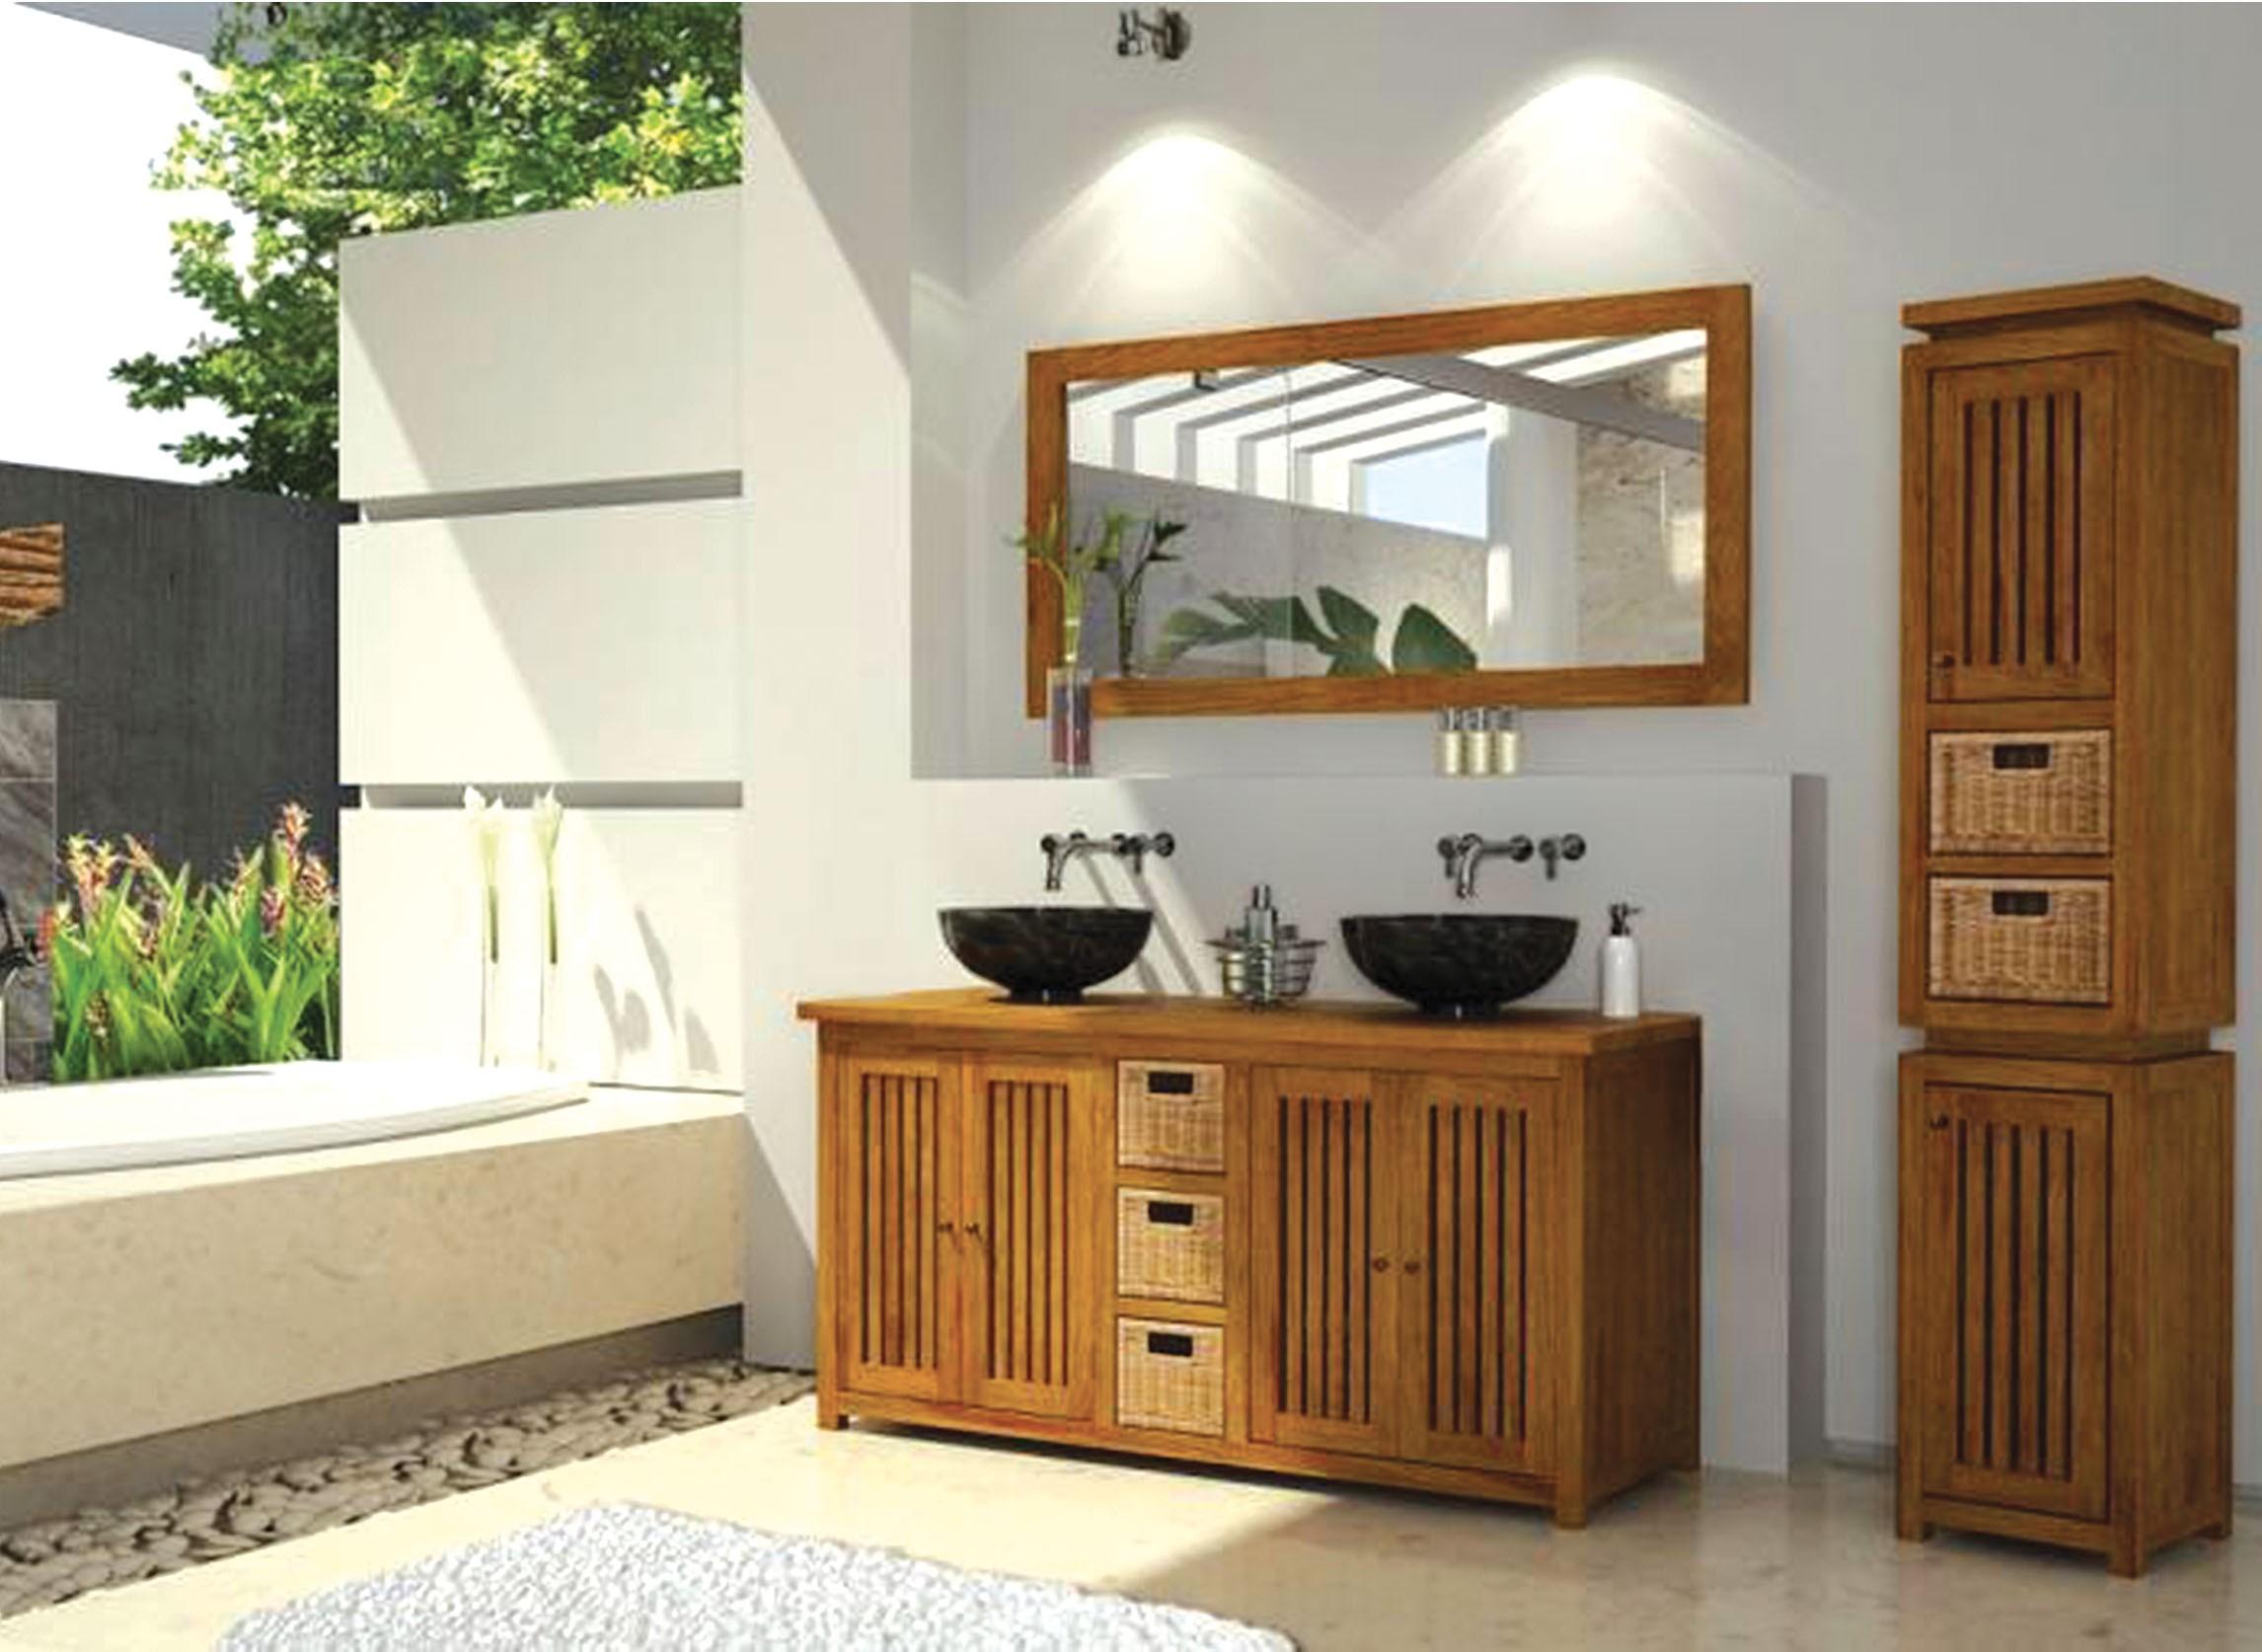 Salles De Bains Bruxelles ~ pascal jr pillet meuble de salle de bain en teck java 145 cm hyper